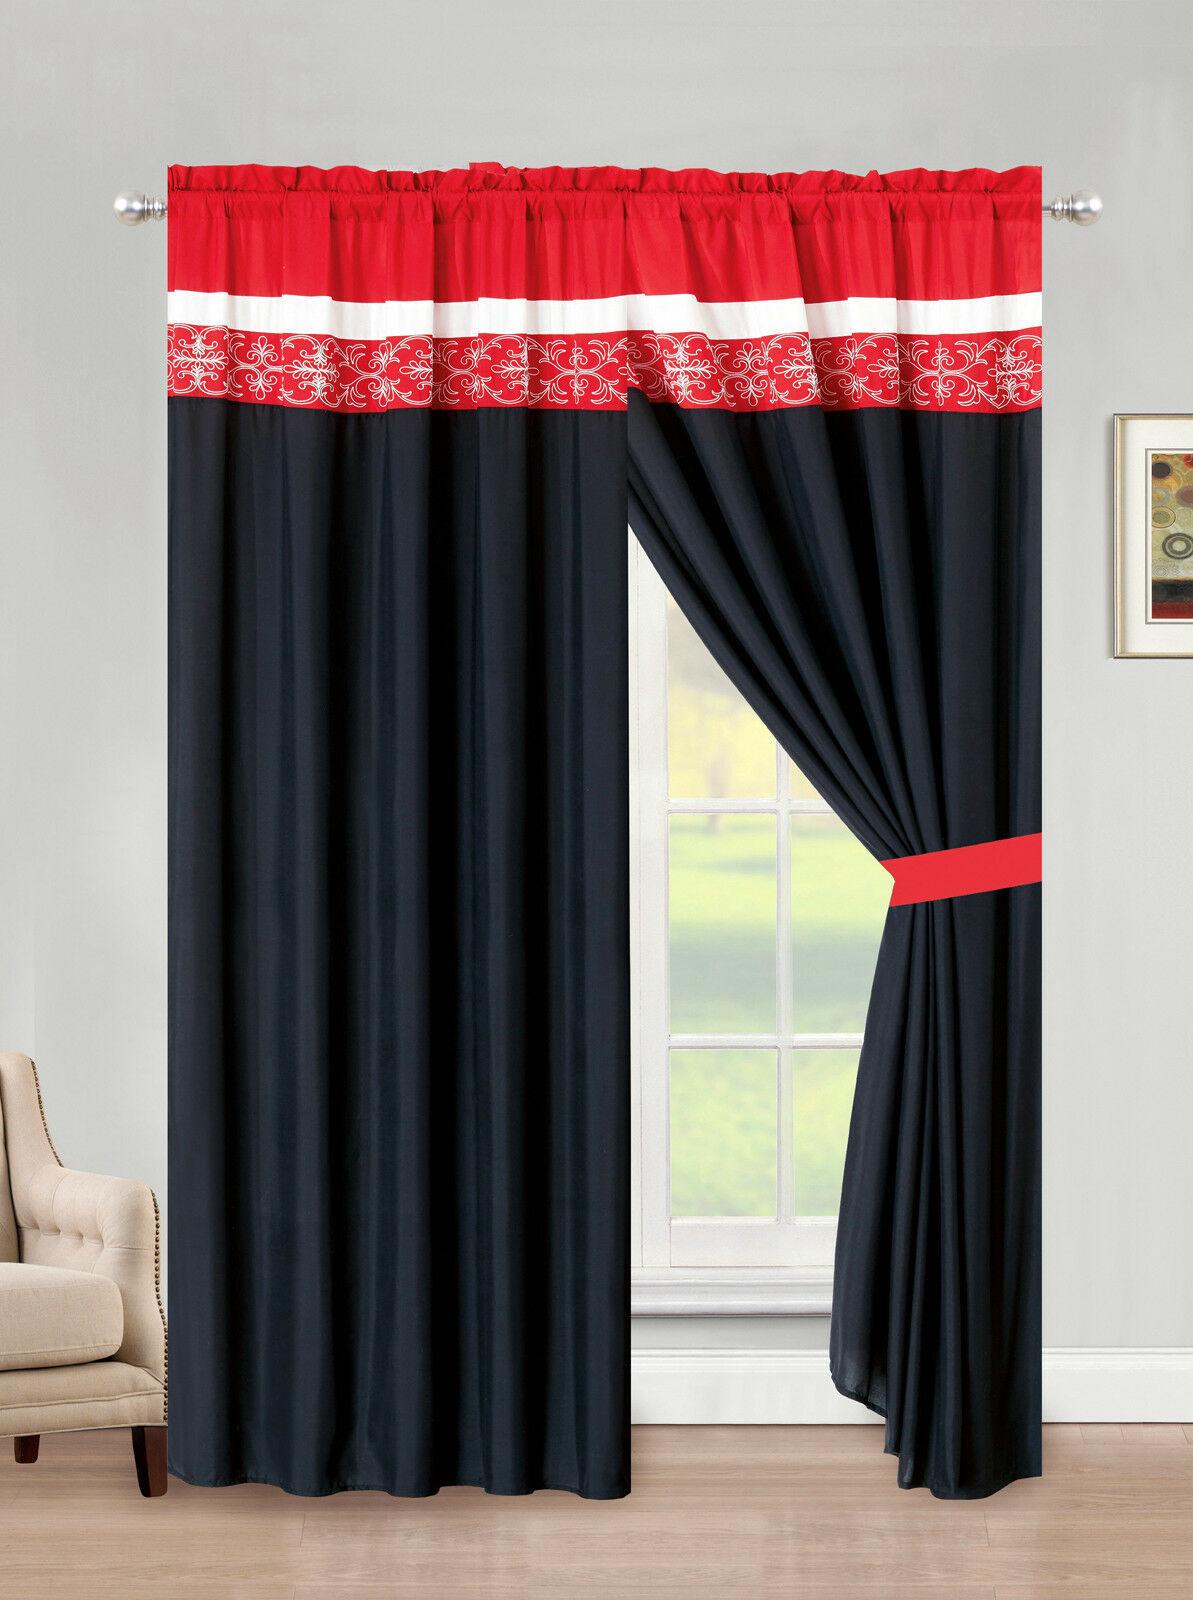 4-Pc Preston Royal Damask Floral Scroll Curtain Set Red Black White Sheer Drape - $40.89